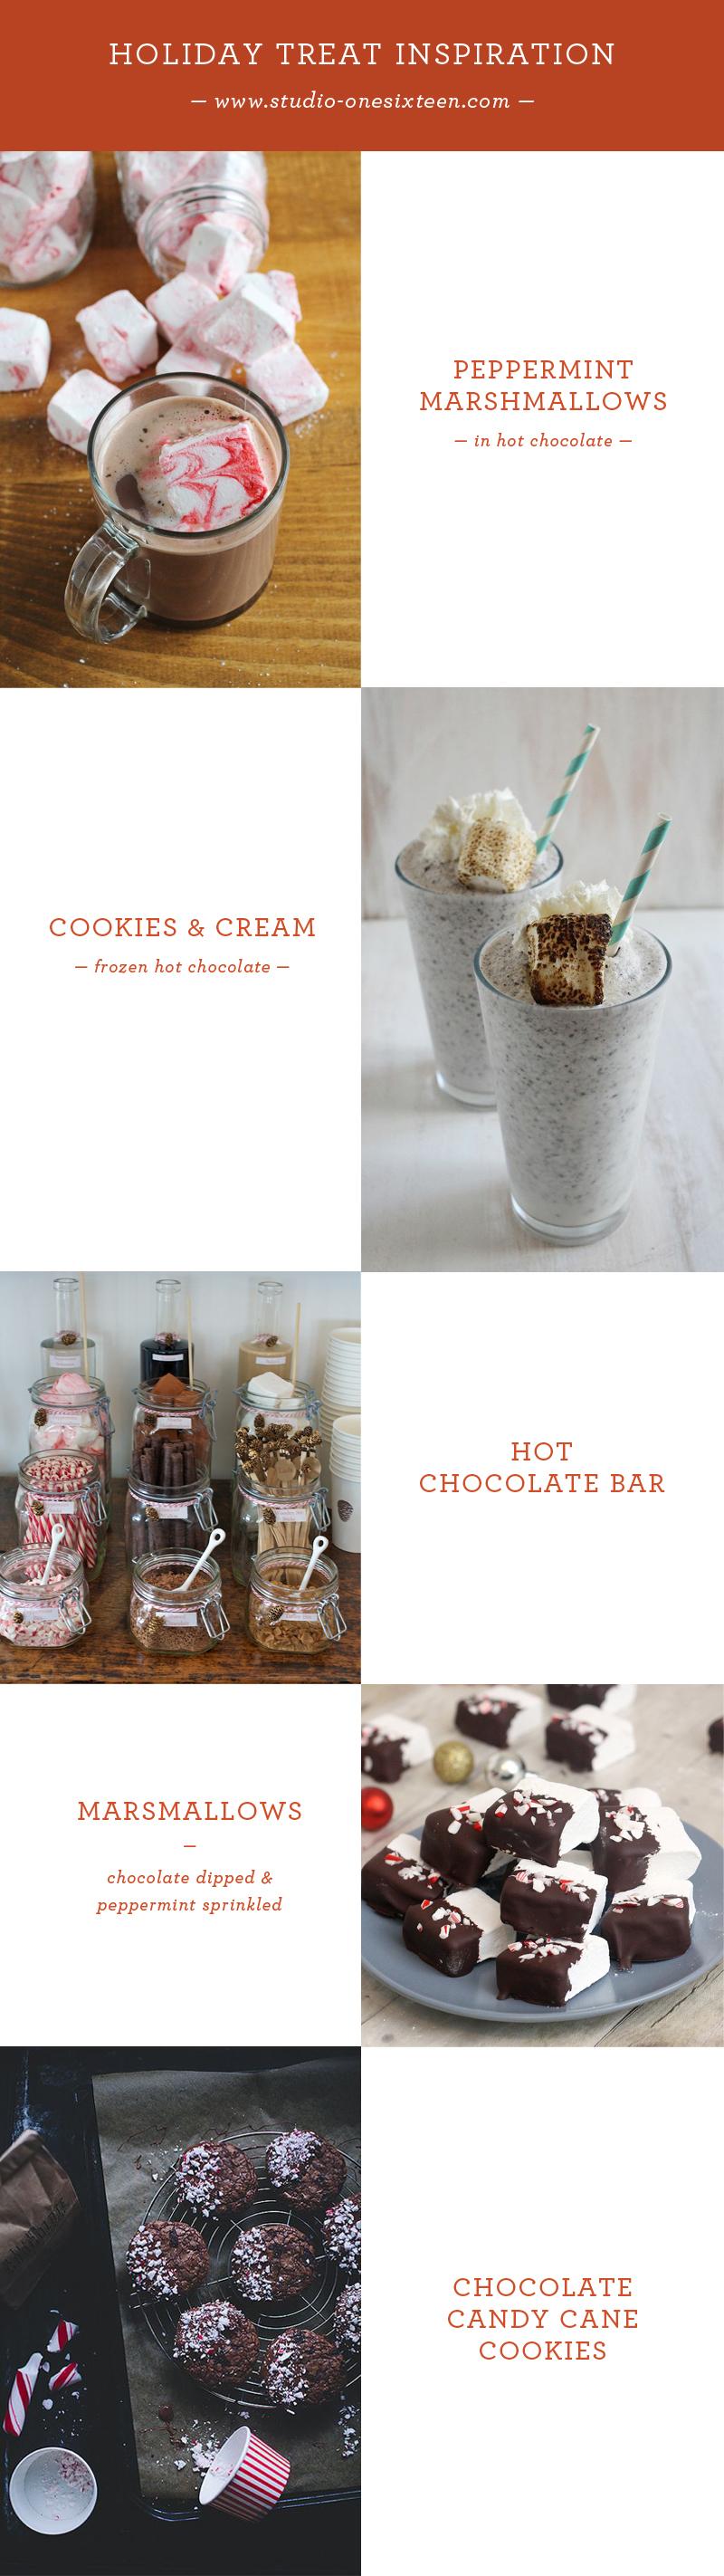 Peppermint Marshmallows / Cookies & Cream Frozen Hot Chocolate / Hot Chocolate Bar / Chocolate Dipped Peppermint Sprinkled Marshmallows / Chocolate Candy Cane Cookies